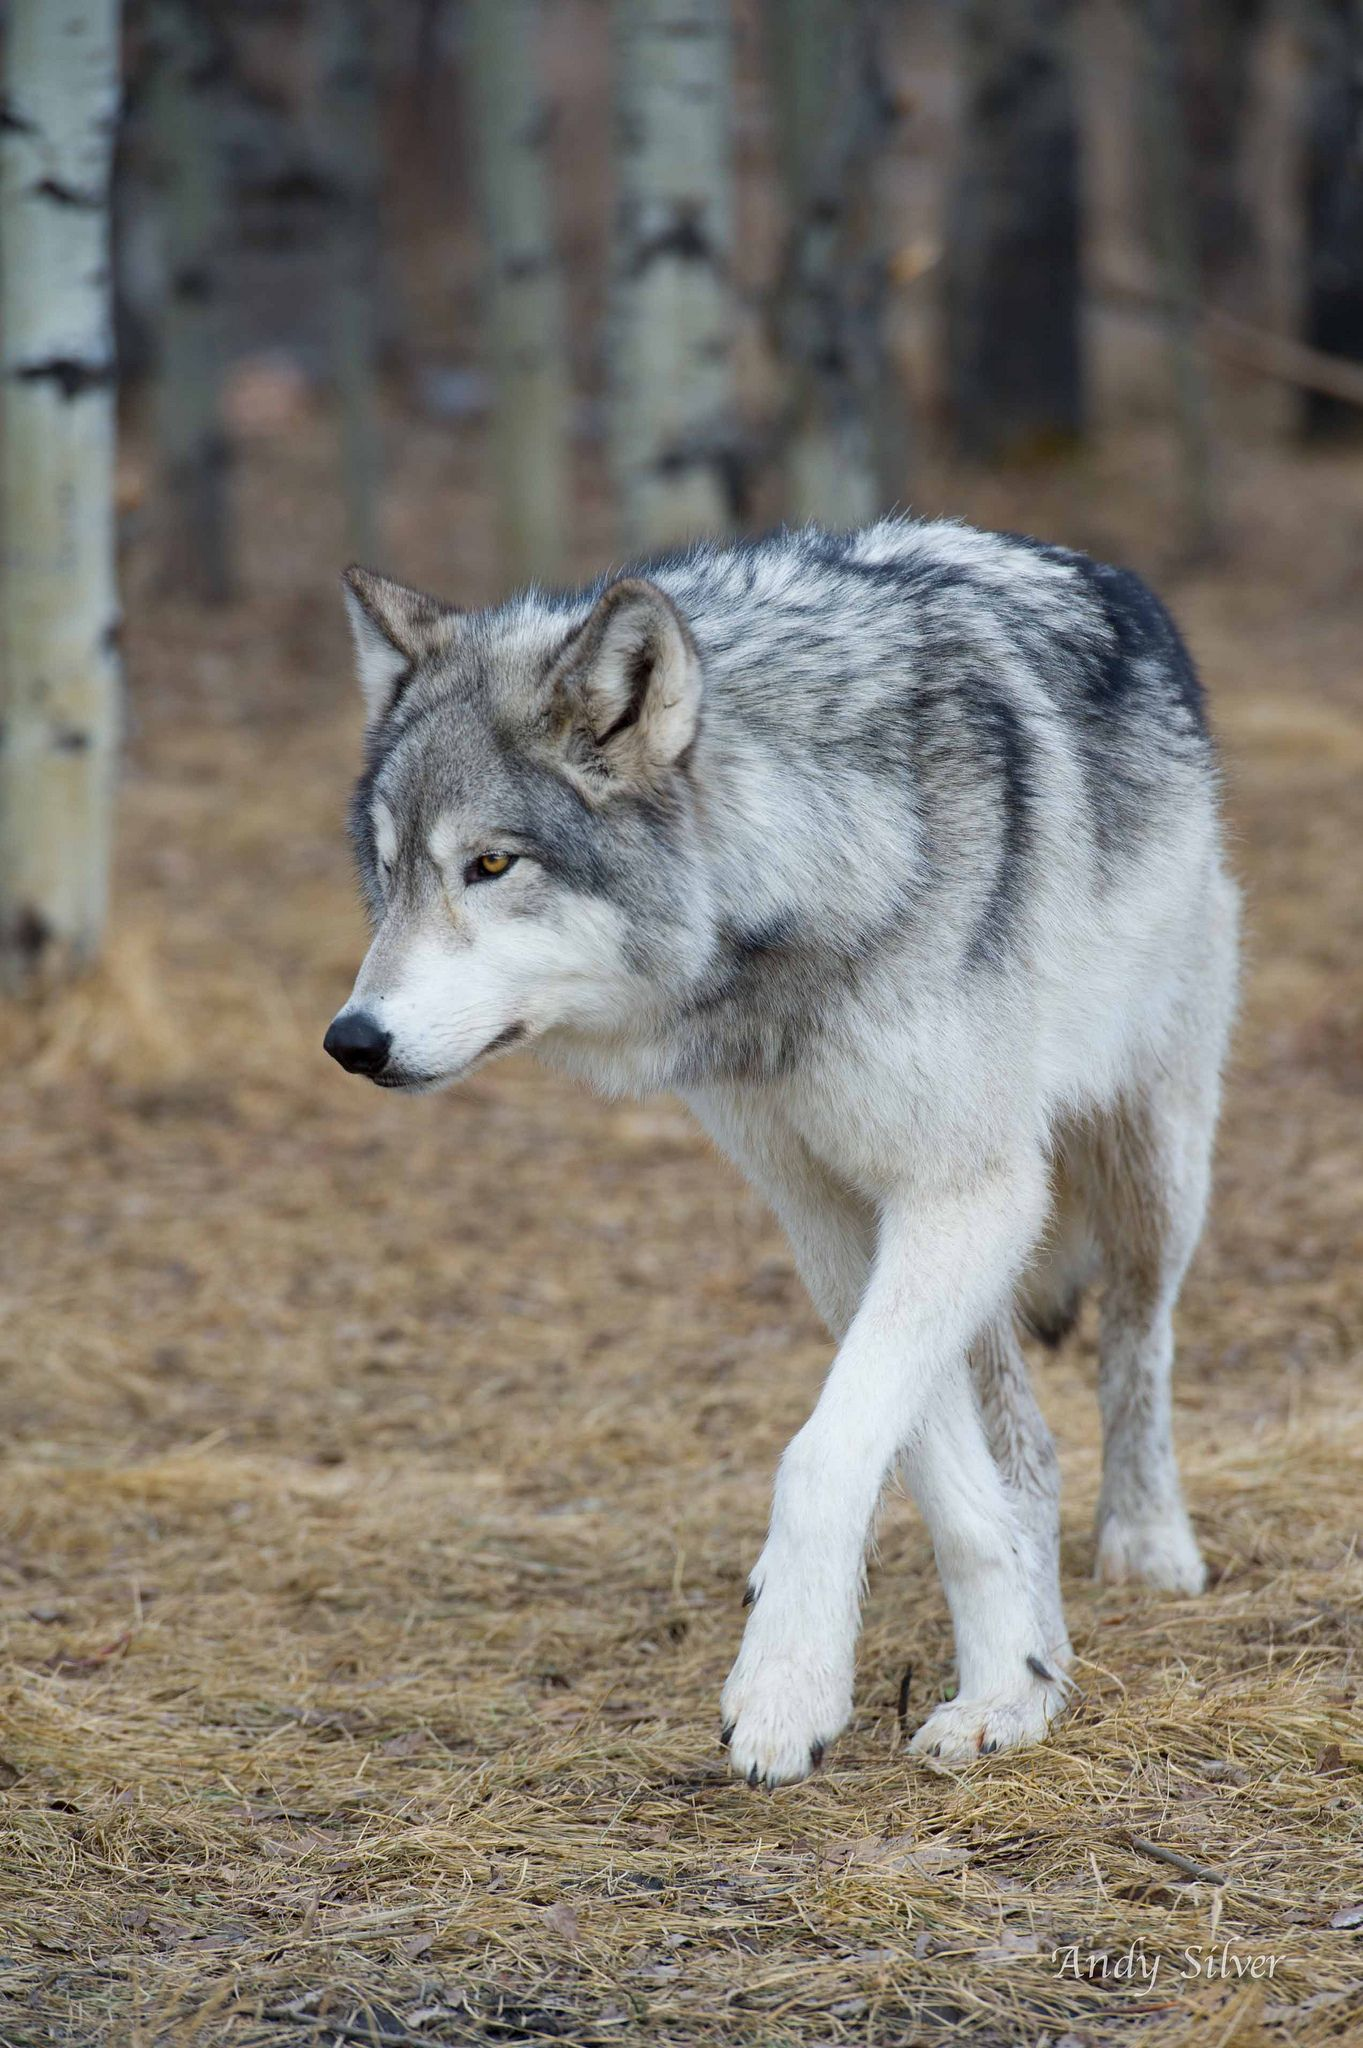 Dsc animals pinterest wolf wildlife photography and wildlife